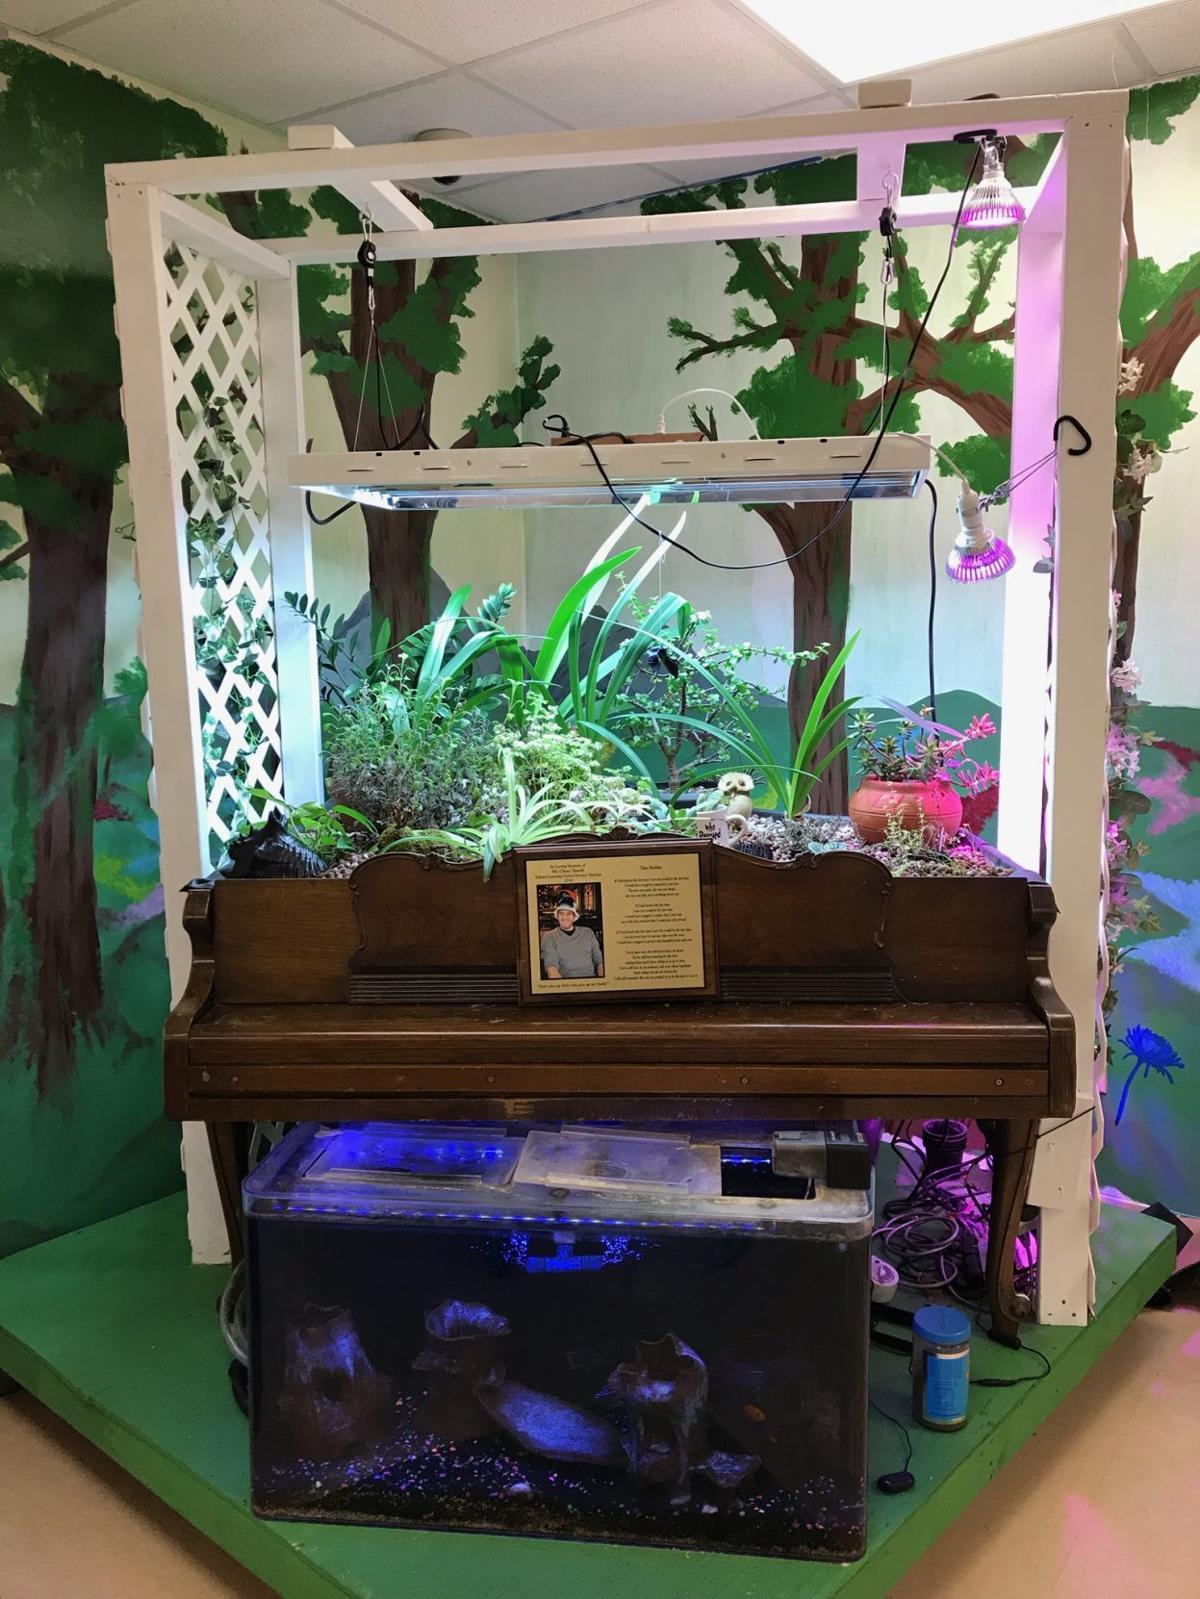 Aquaponics garden at Tokata Learning Center